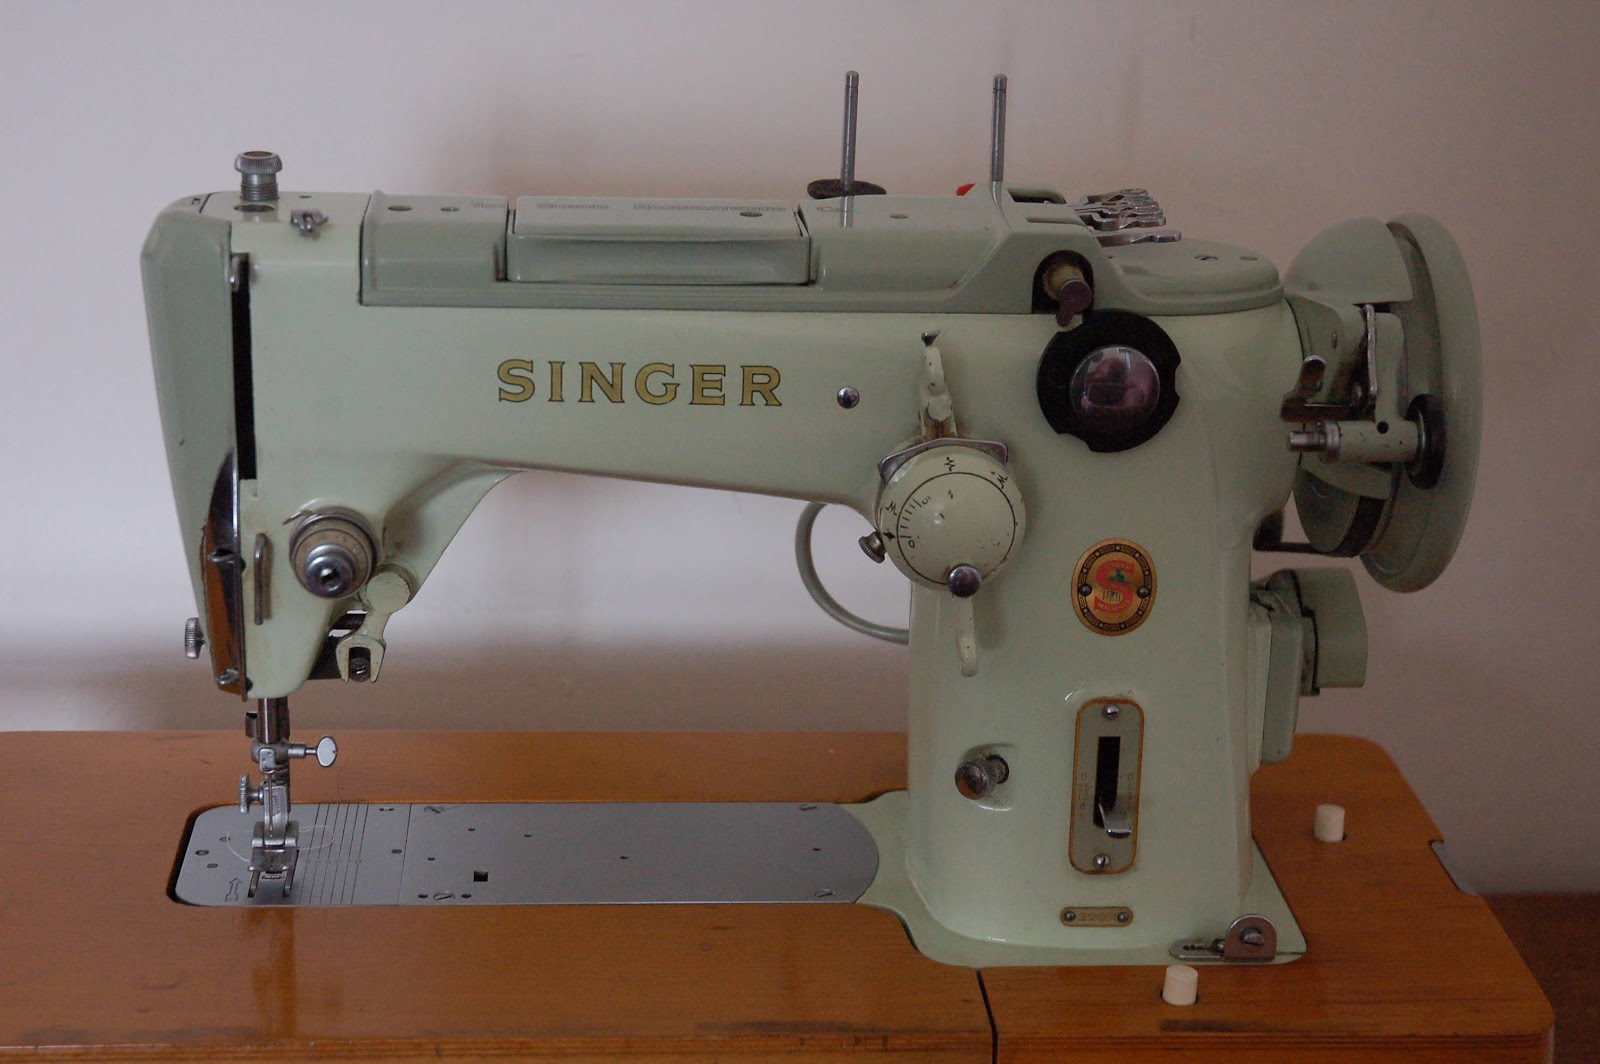 Singers Swing Arm Zig Zag A 320k Old Singer Sewing Machines Machine Wiring Diagram Sold